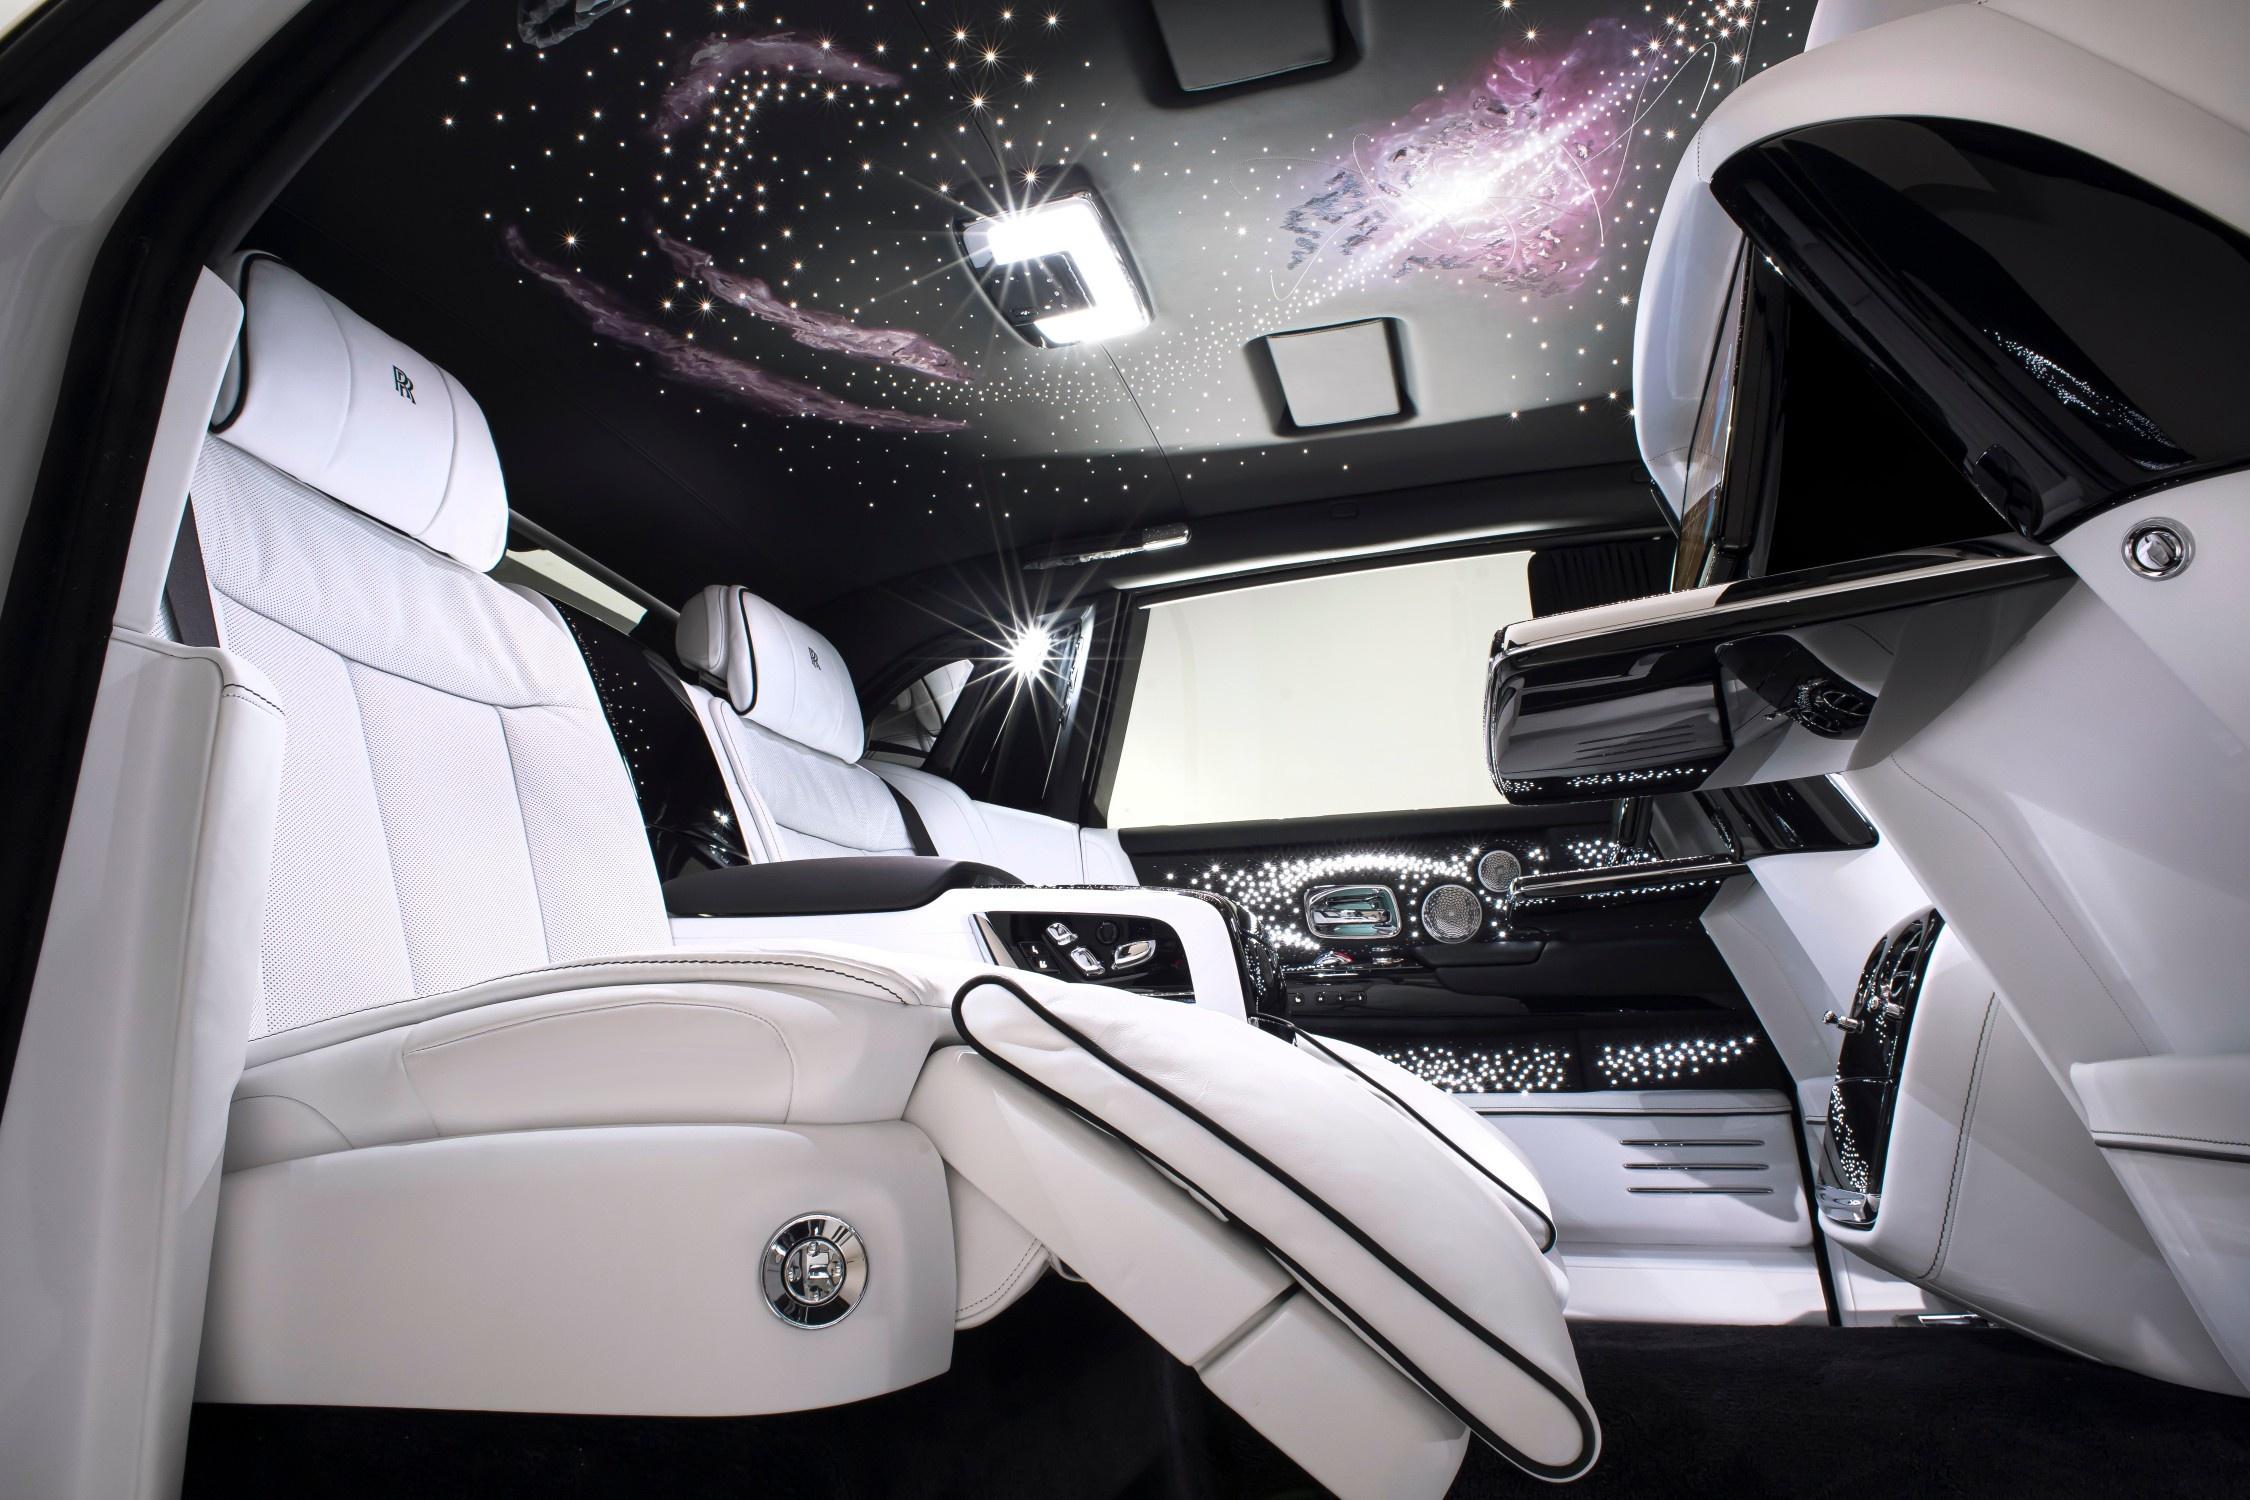 ban dac biet Rolls-Royce Phantom Tempus anh 5